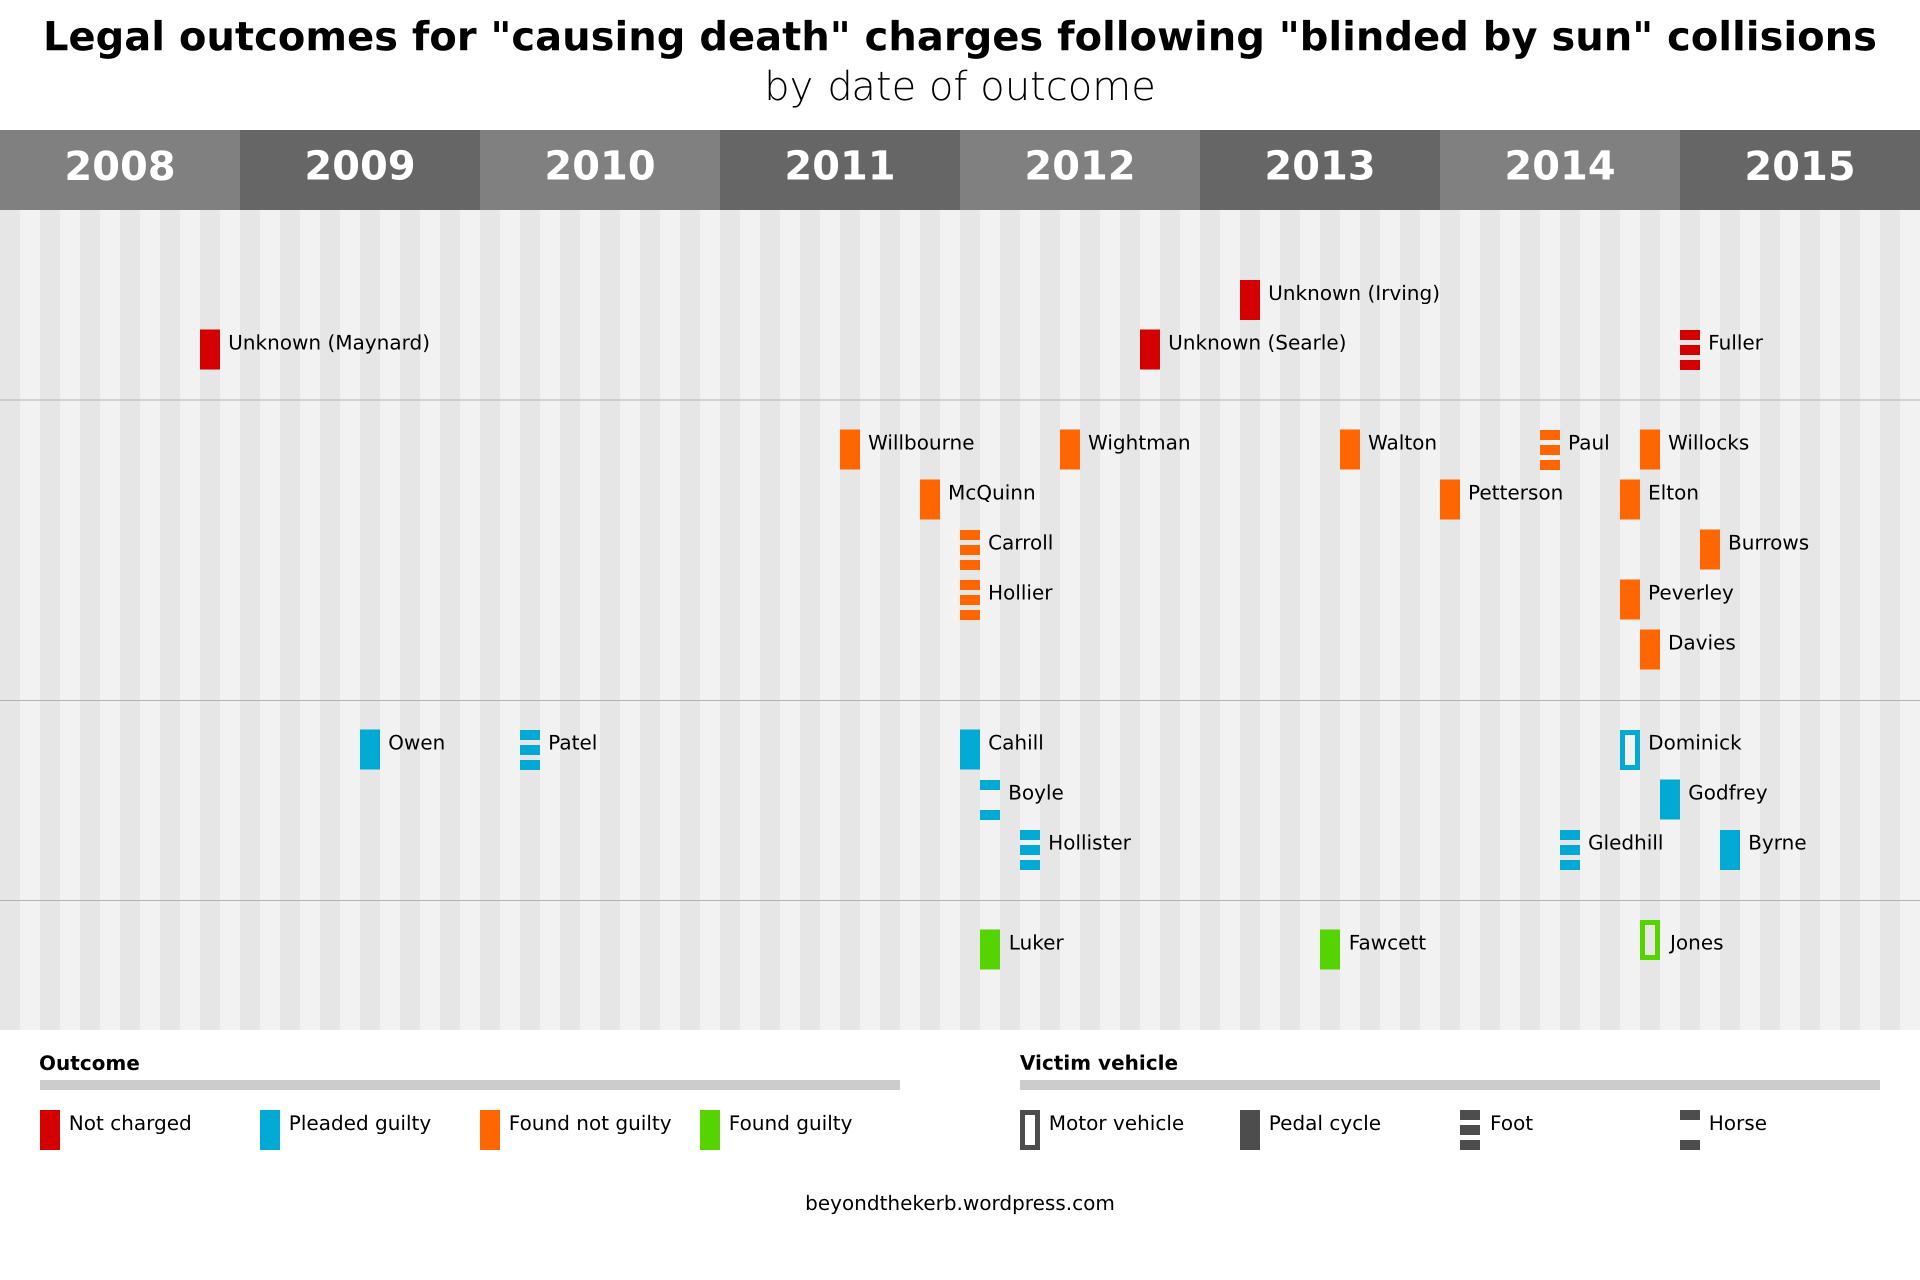 low-sun-deaths